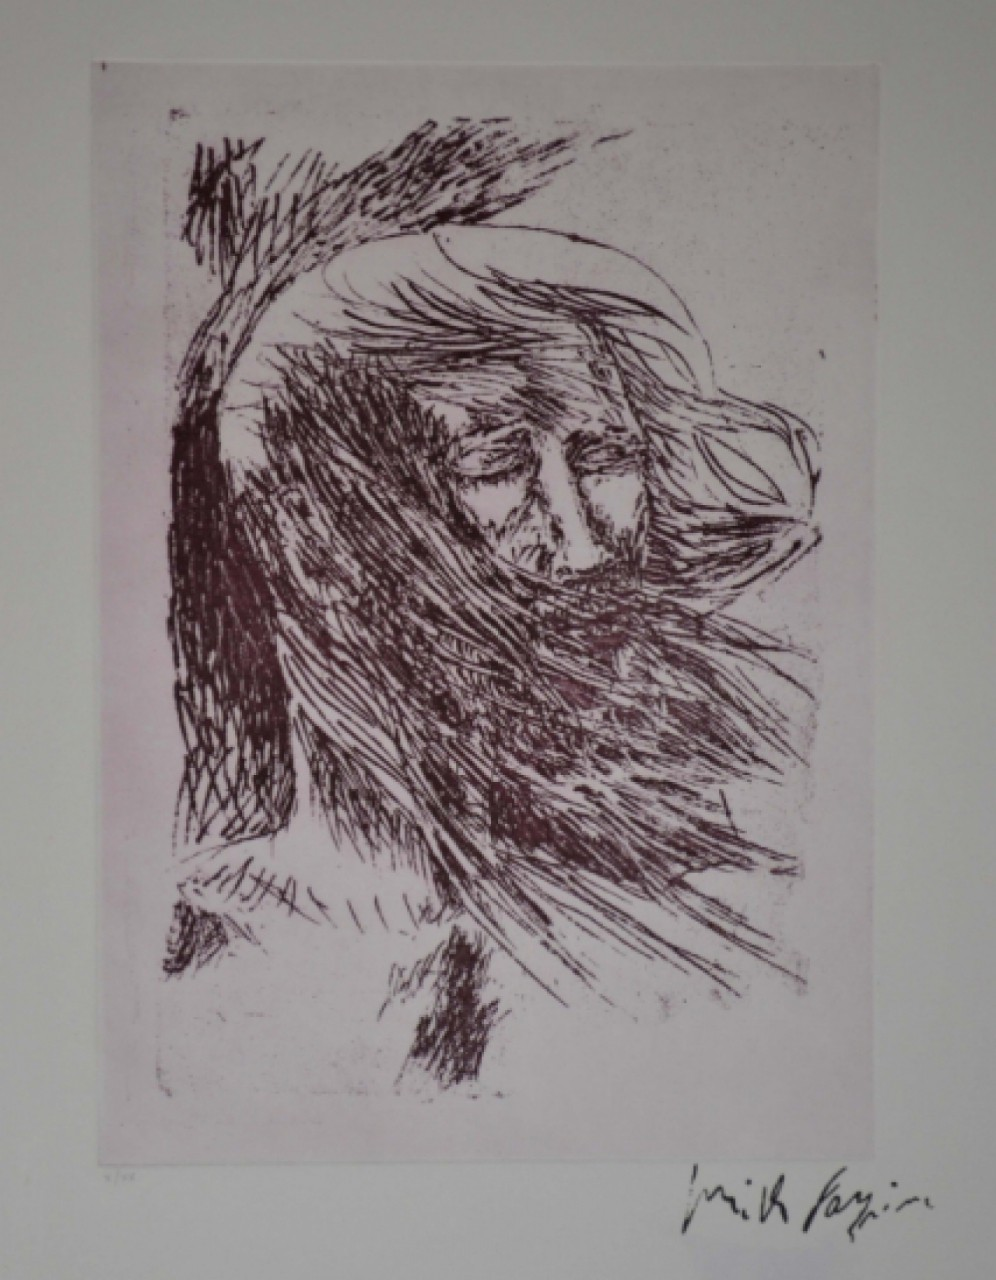 FAZZINI Pericle homme barbu